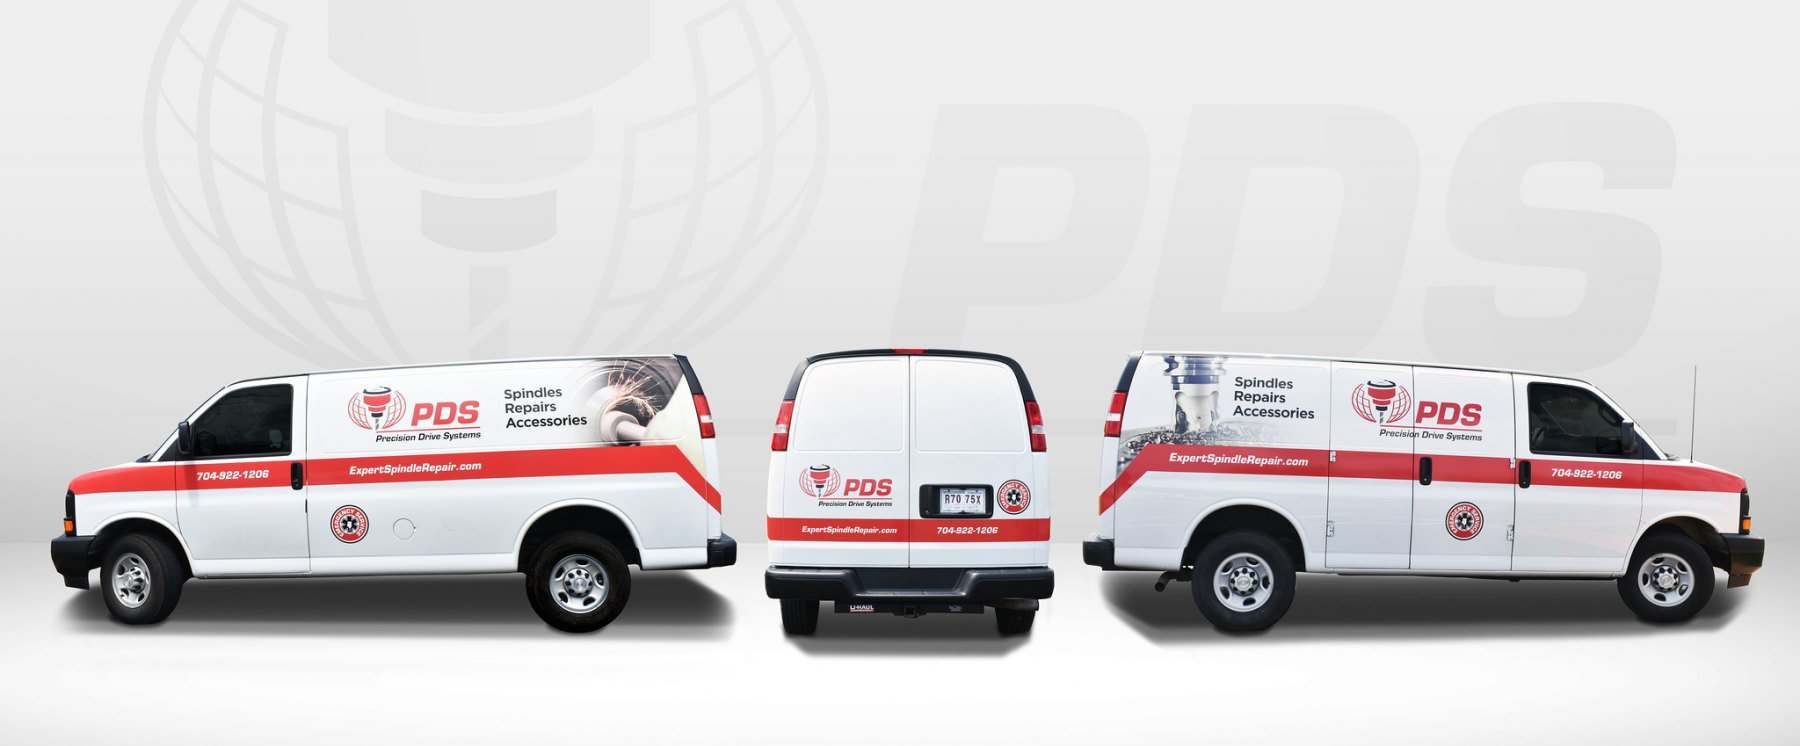 pds-vehicle-wrap